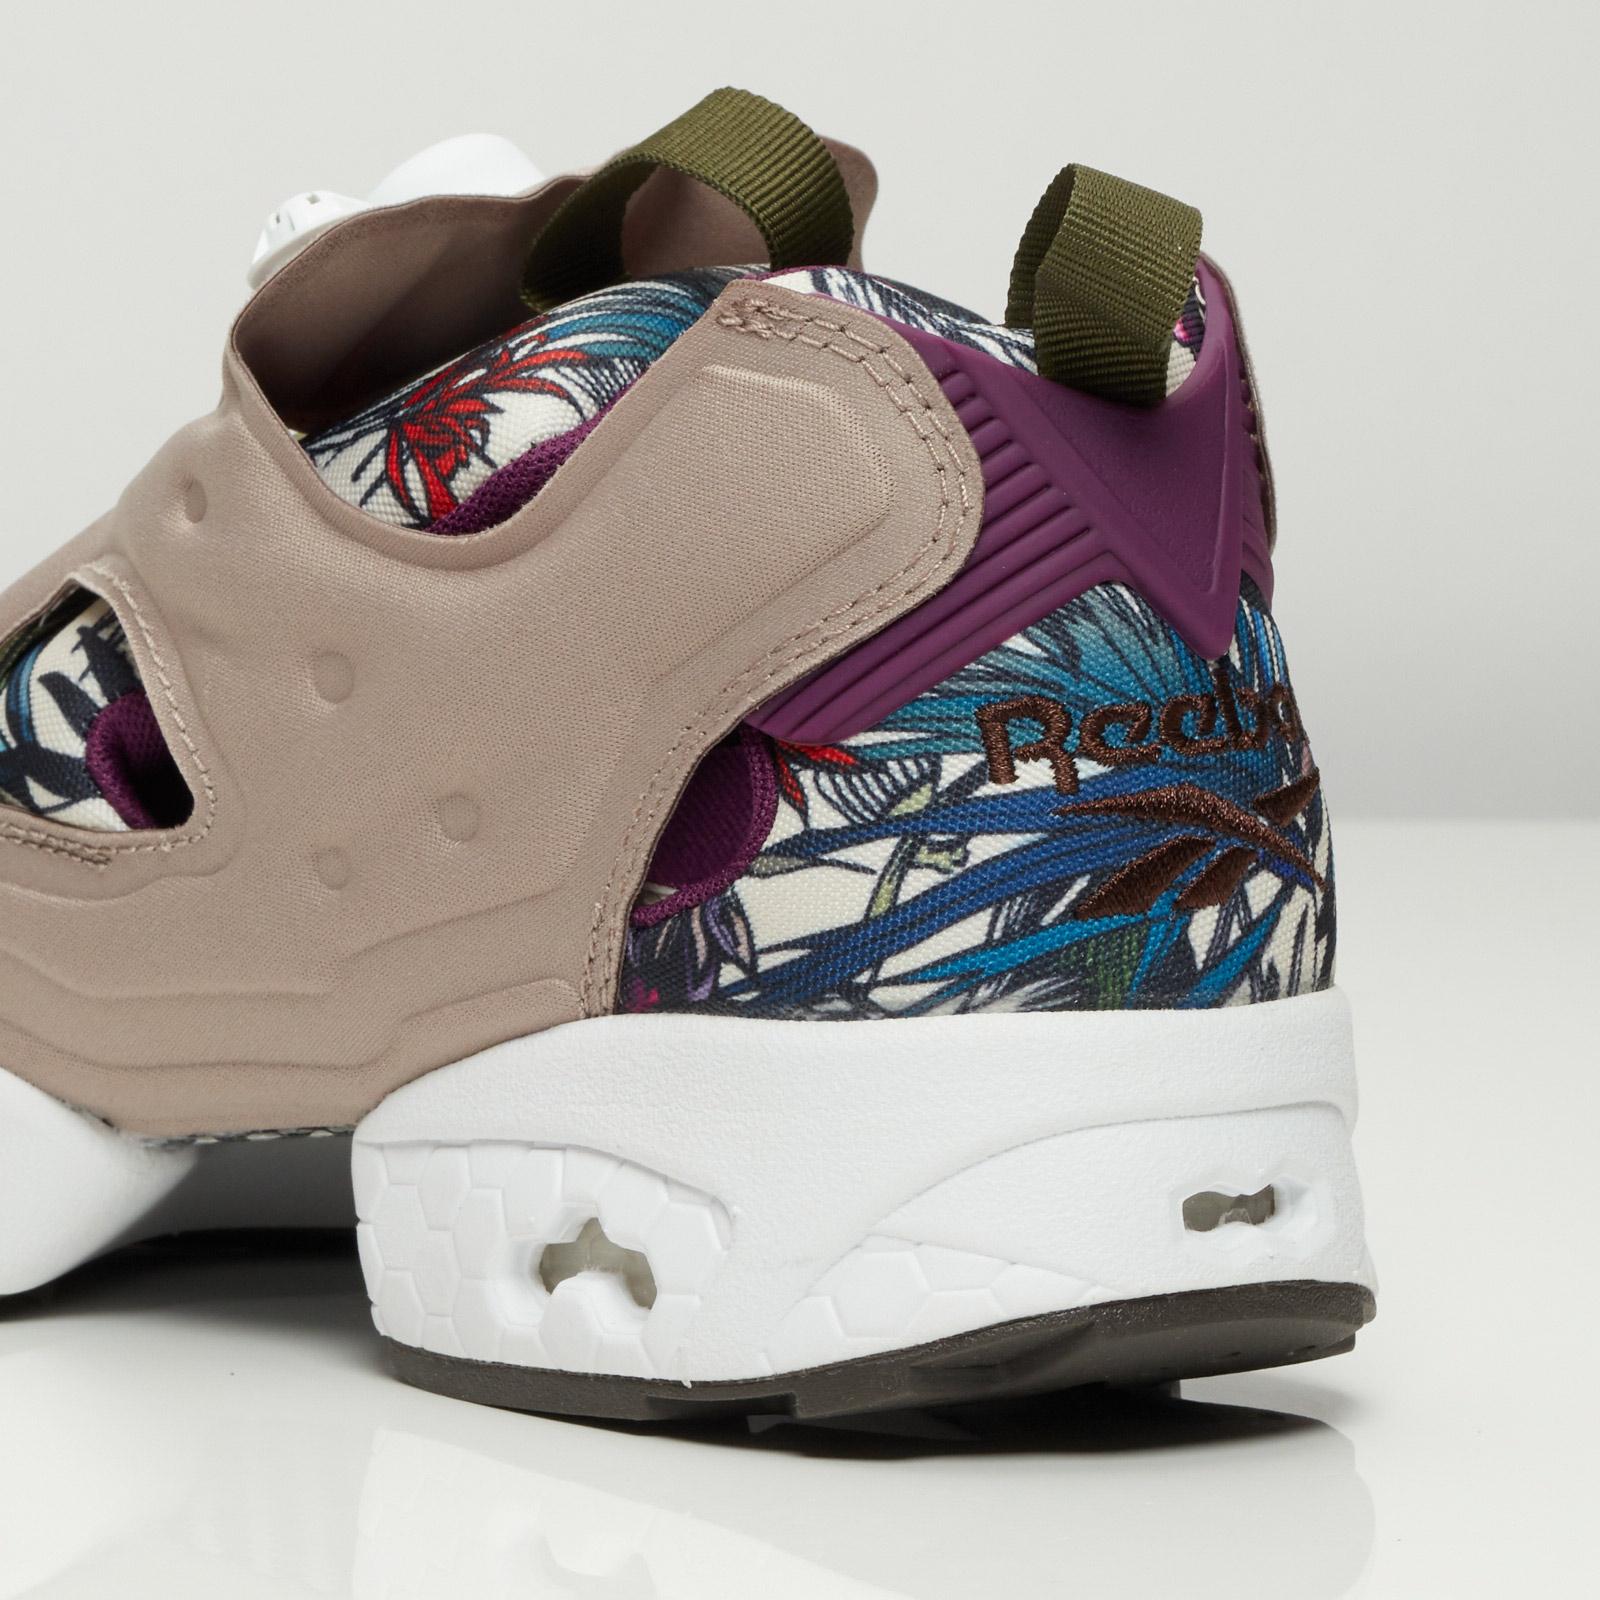 805bfd00a5925e Reebok Instapump Fury SG - V70101 - Sneakersnstuff